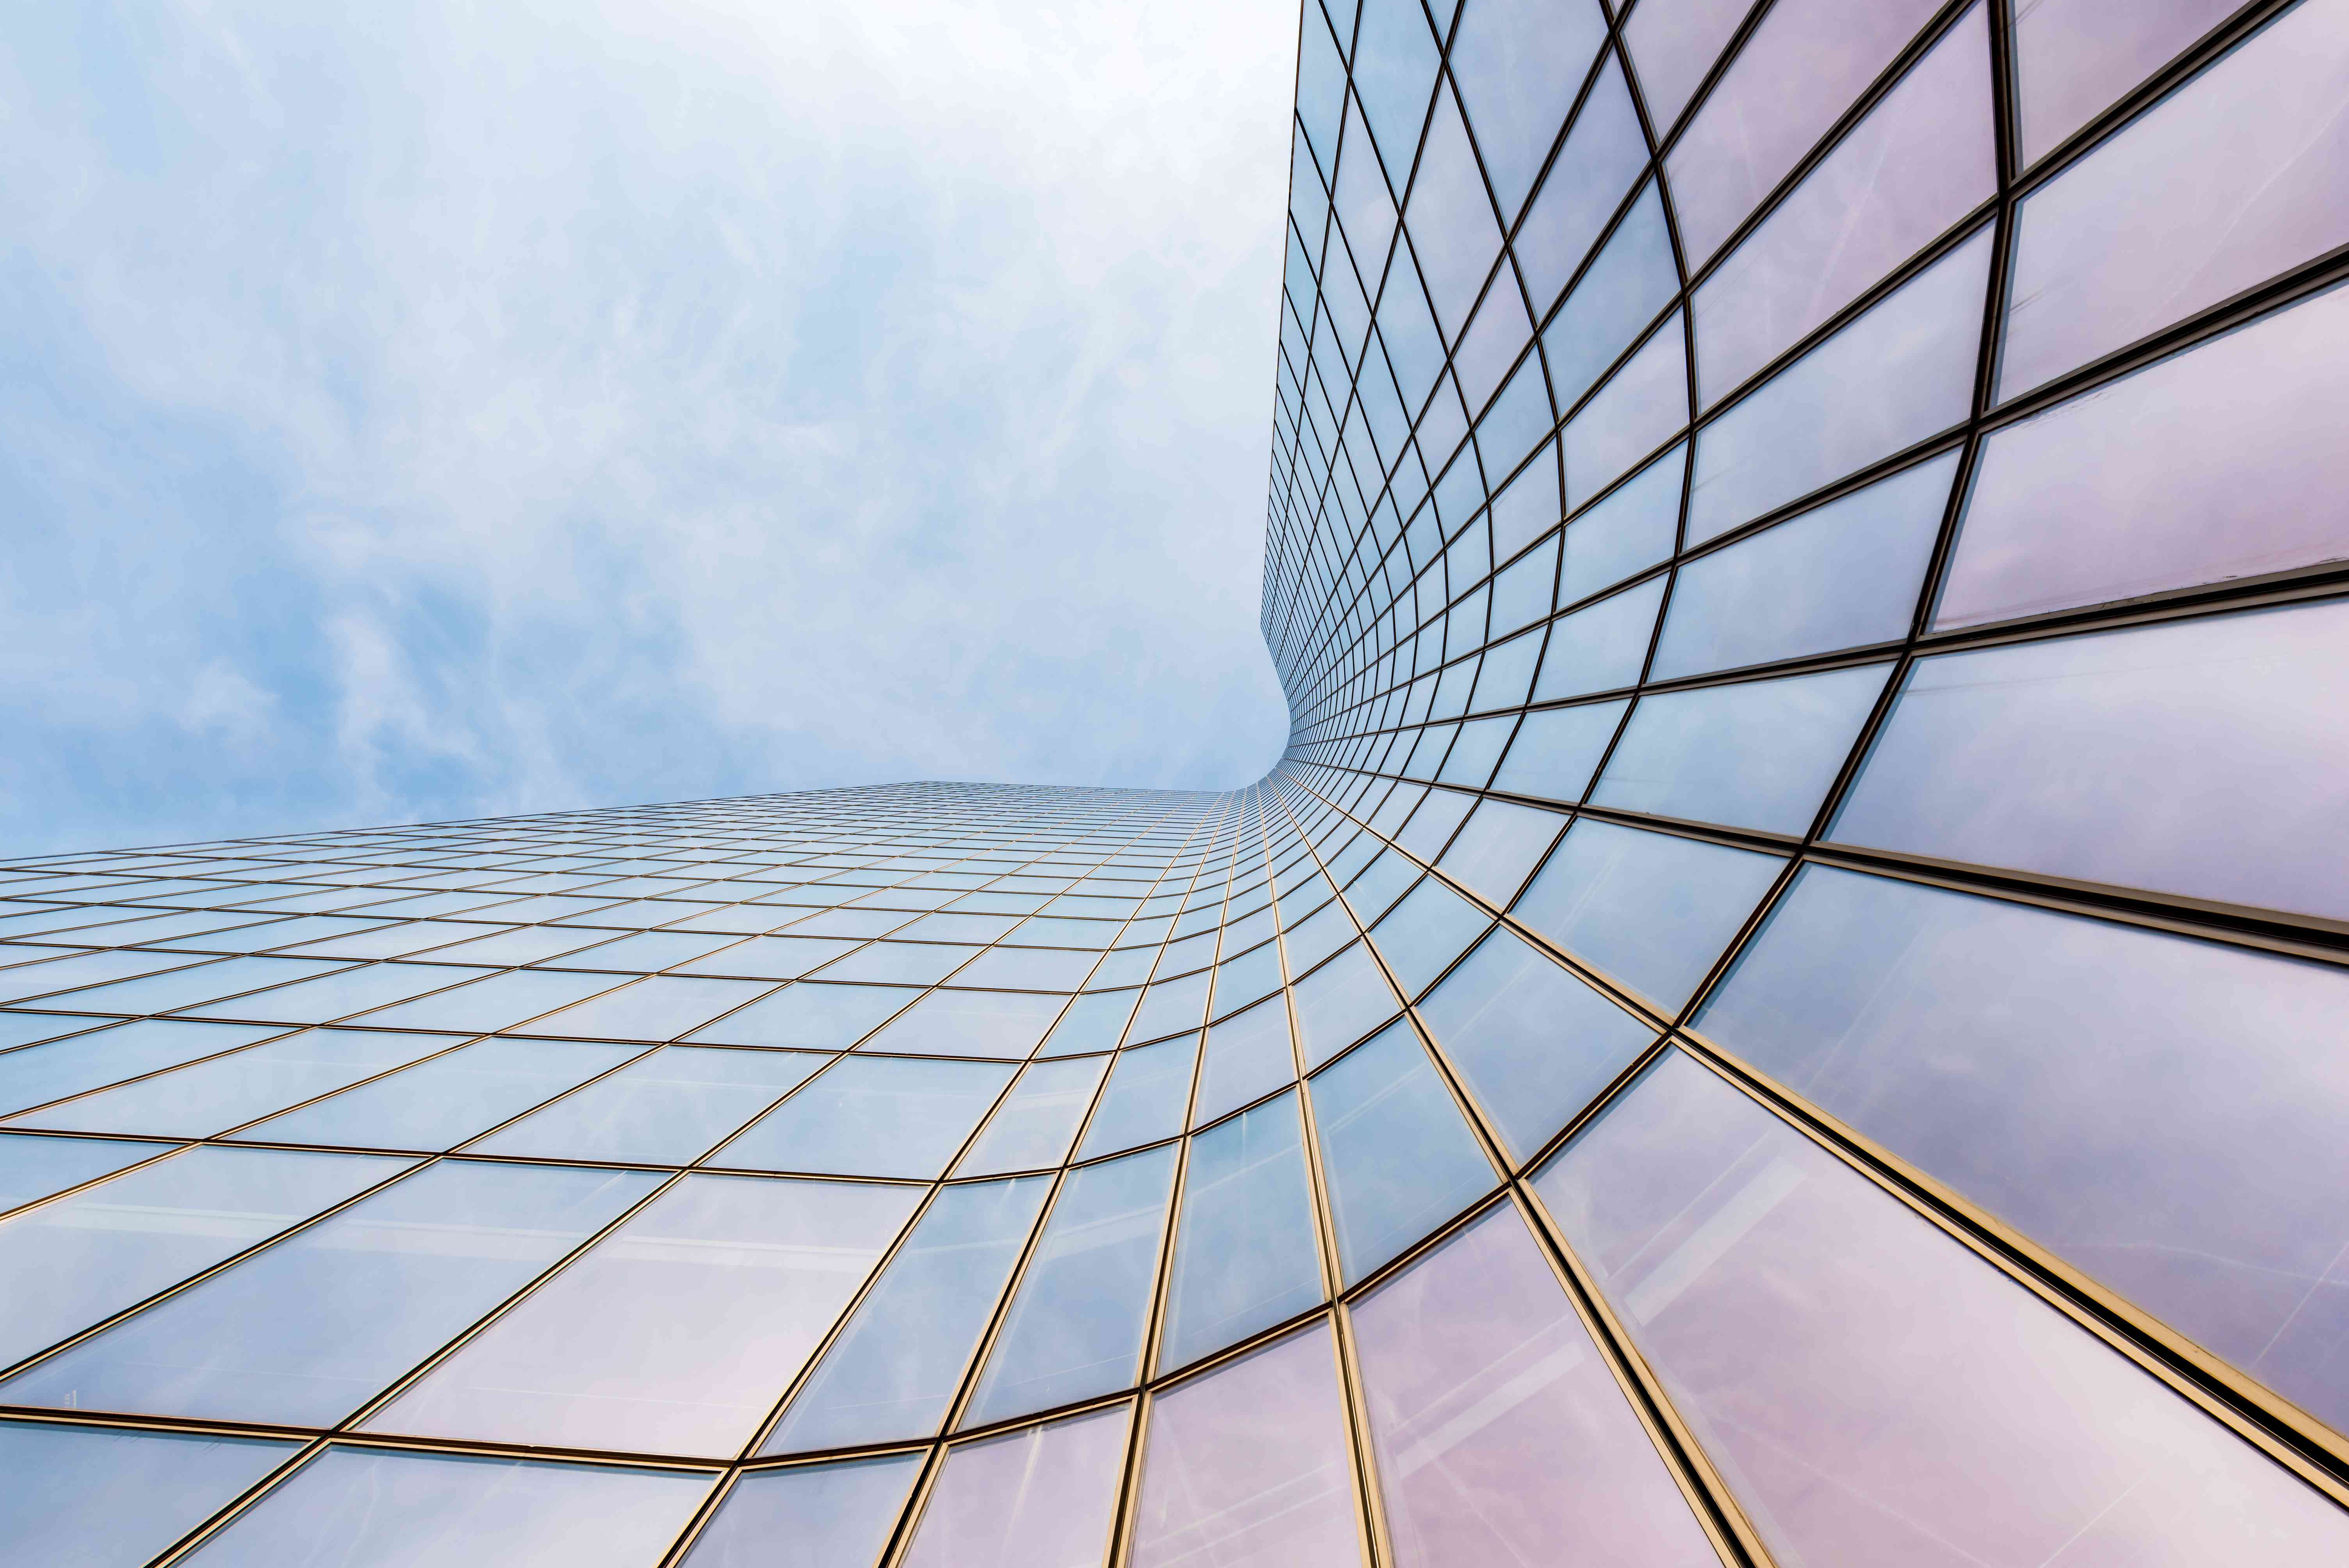 Corporate Finance Definition